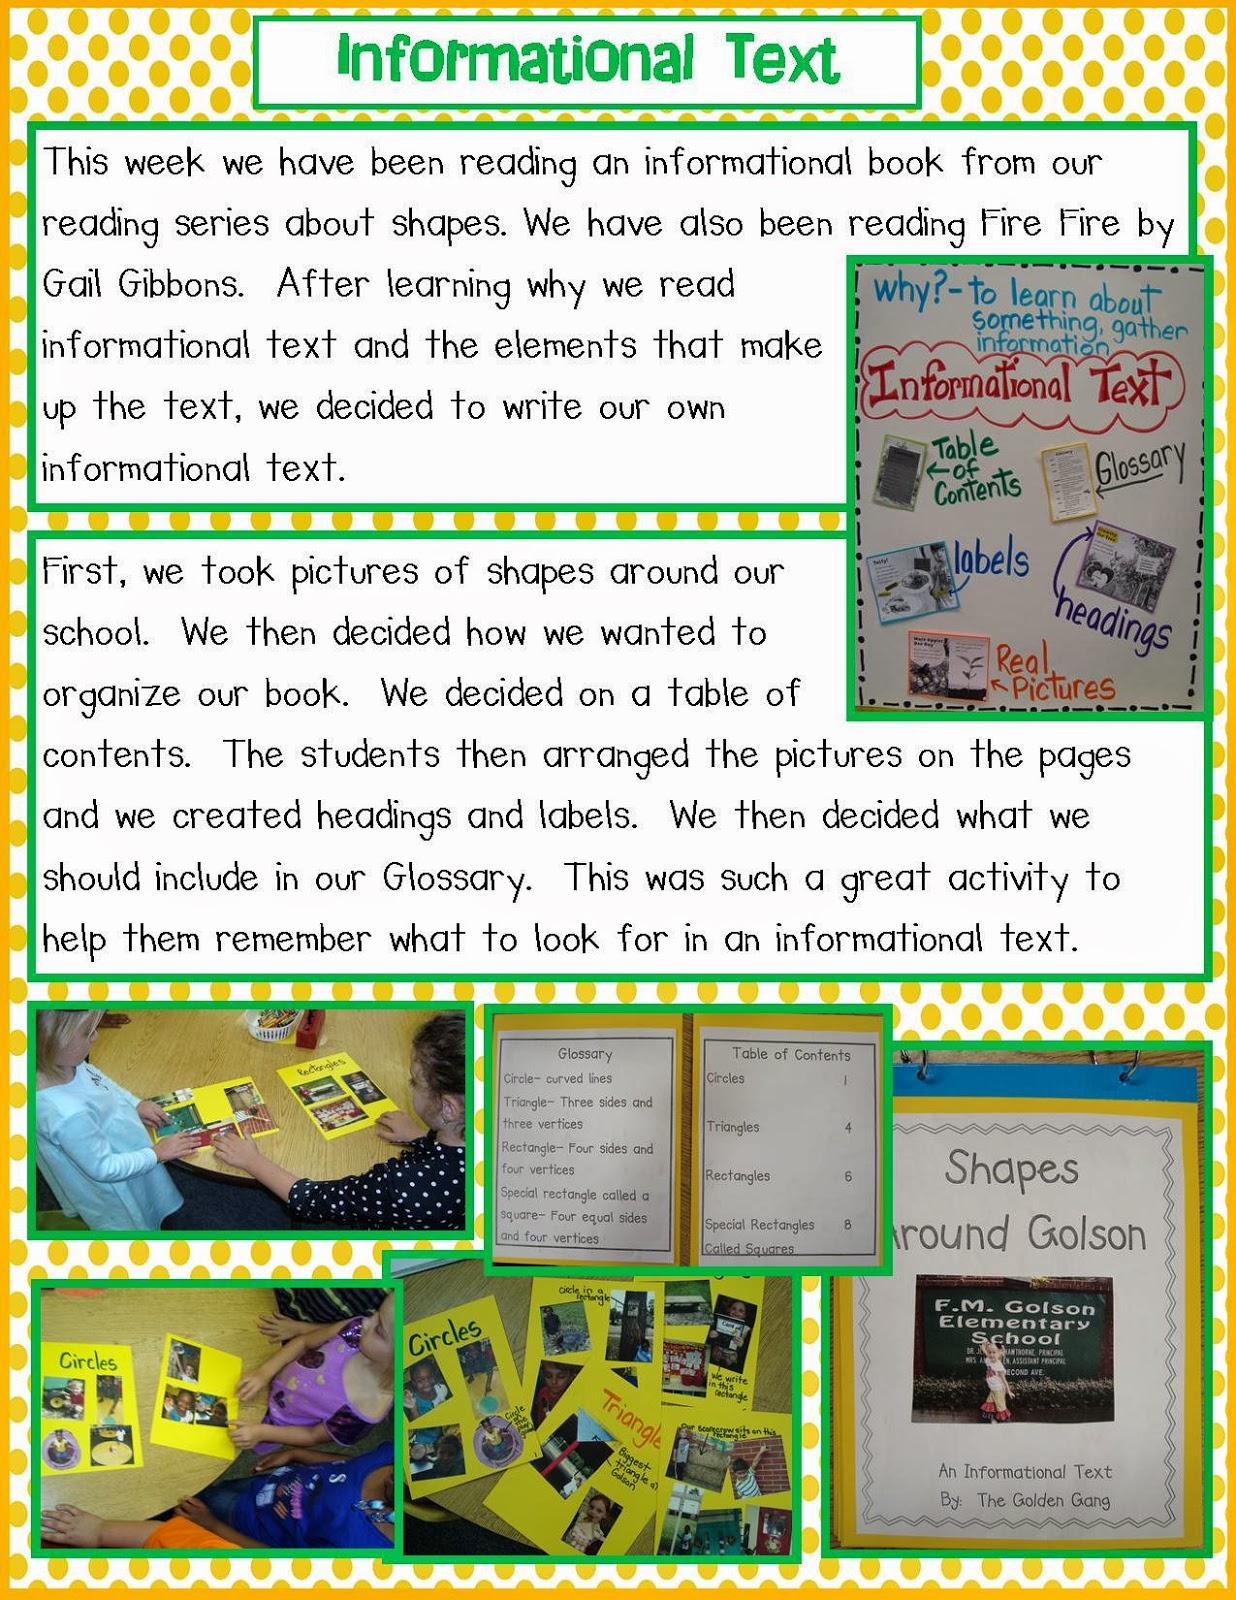 Golden Gang Kindergarten Informational Text